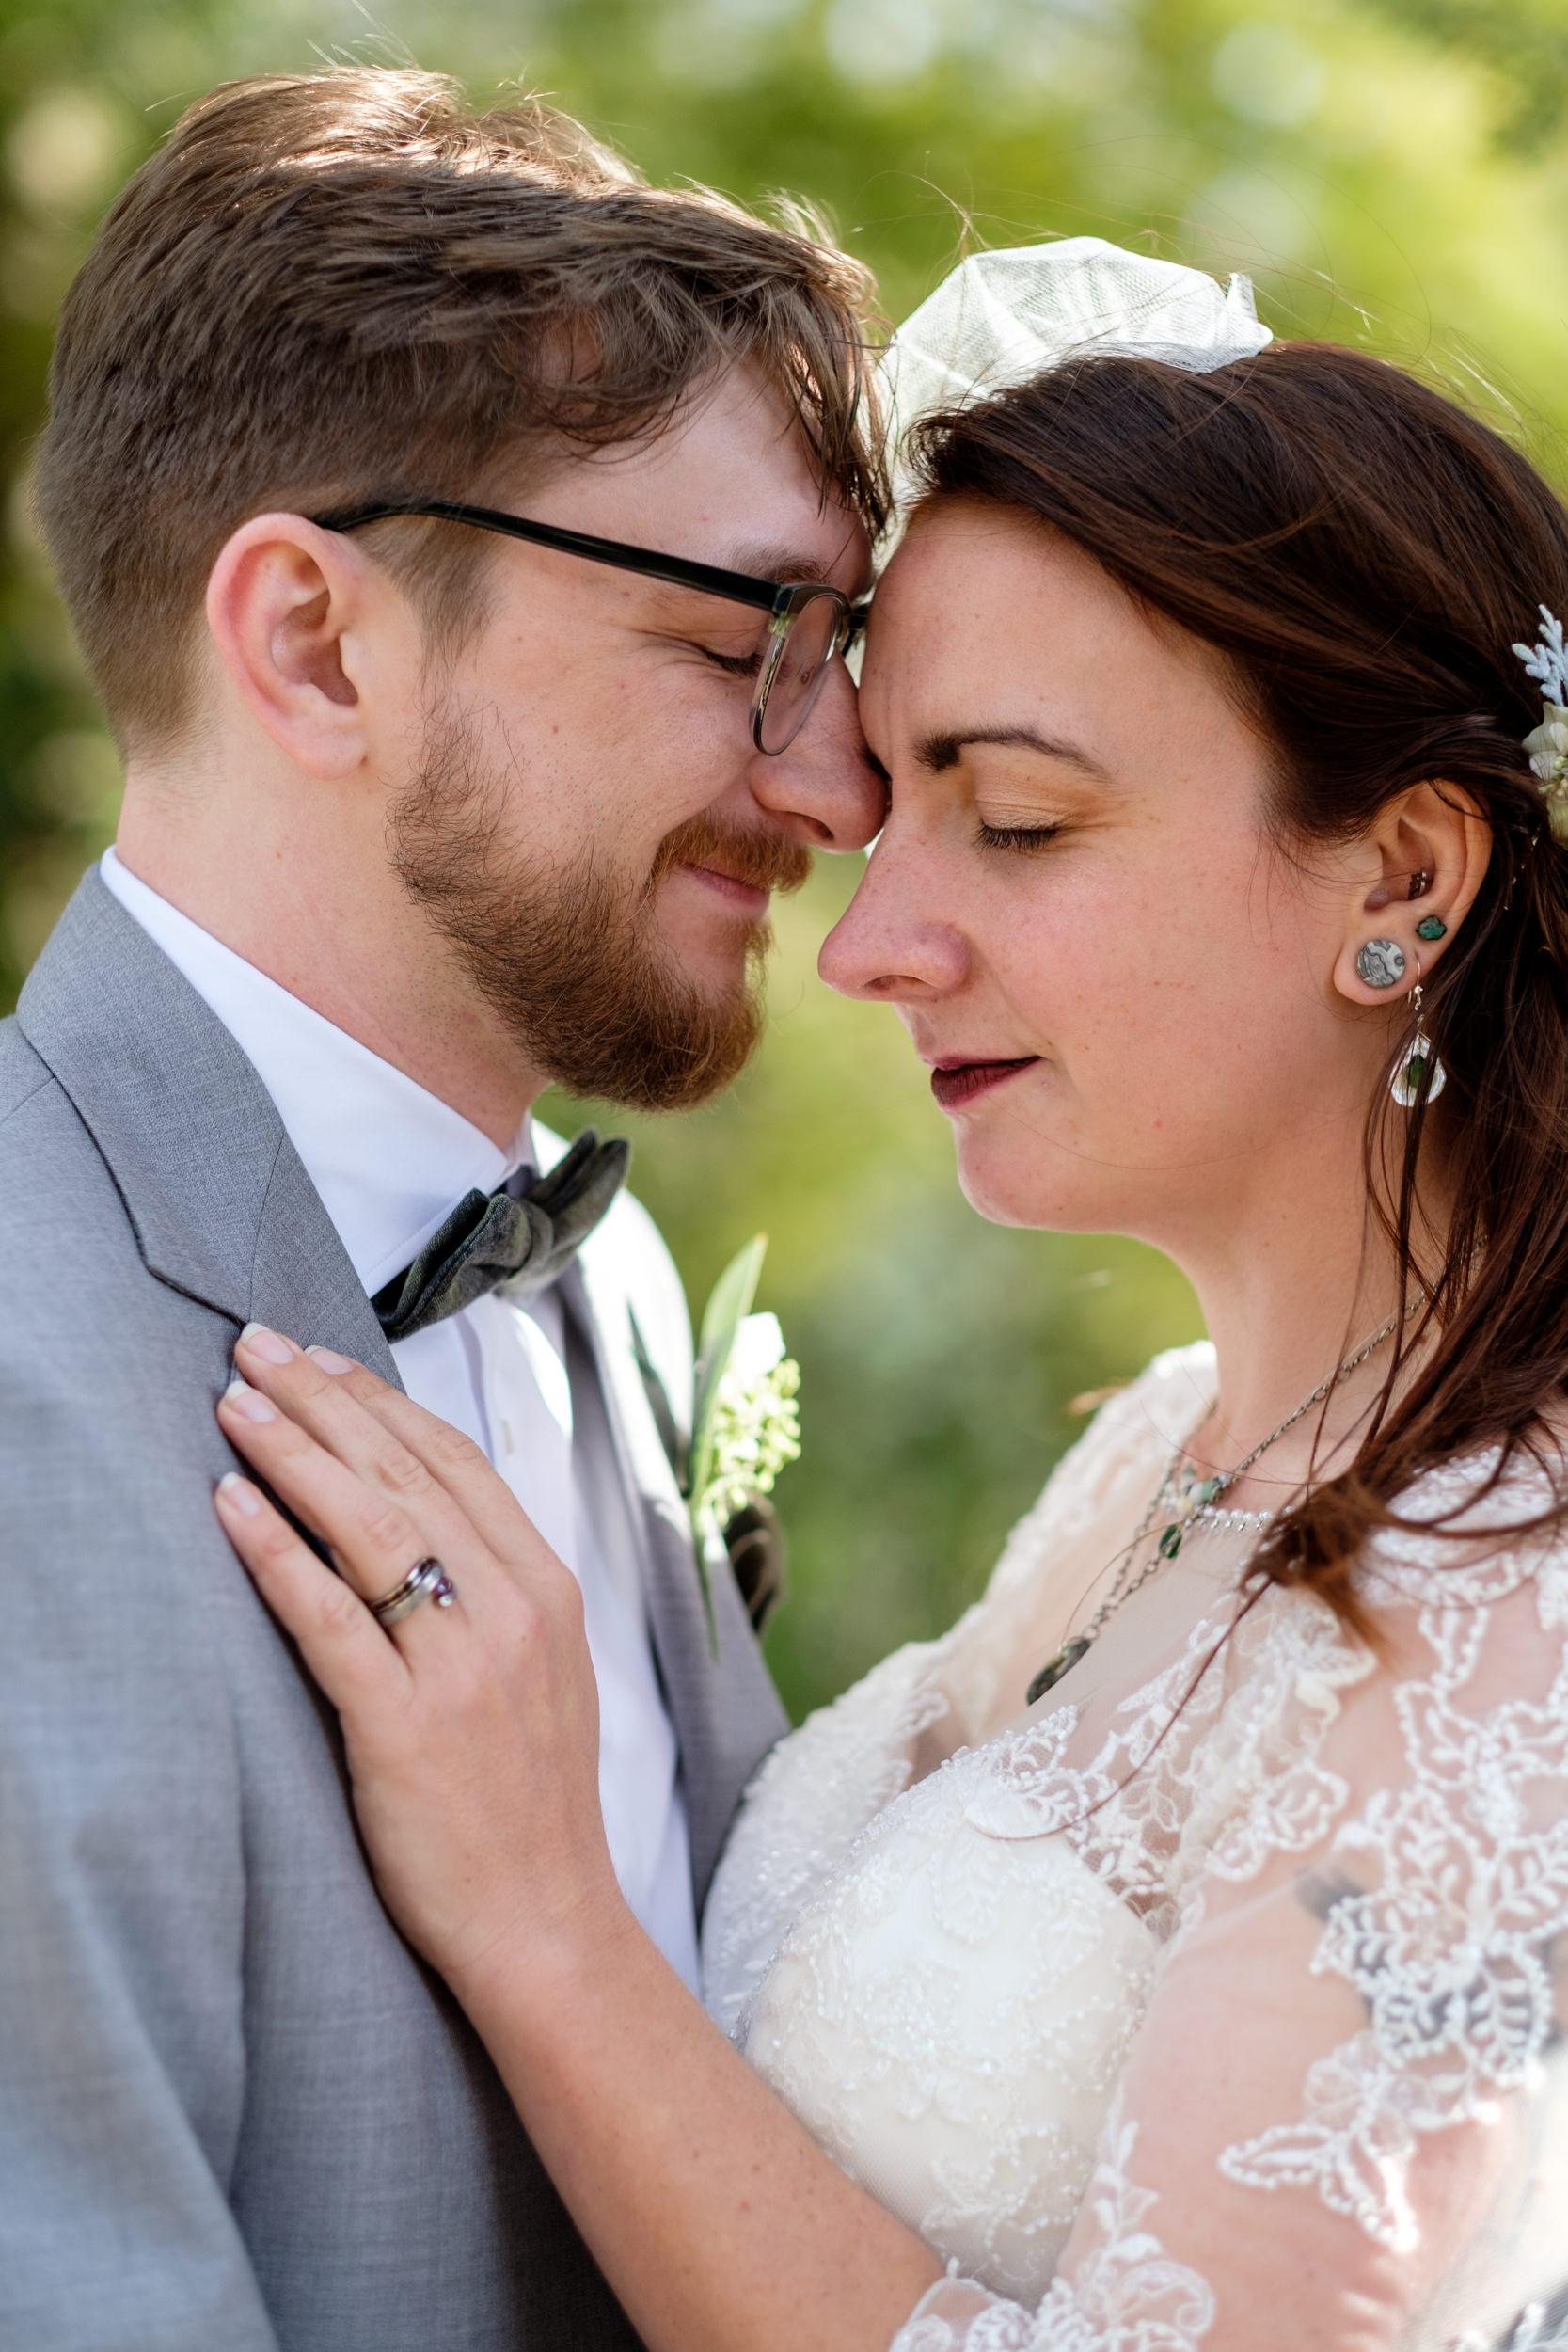 TheSmythCollective-Best-Cincinnati-Wedding-Photographer-044.jpg